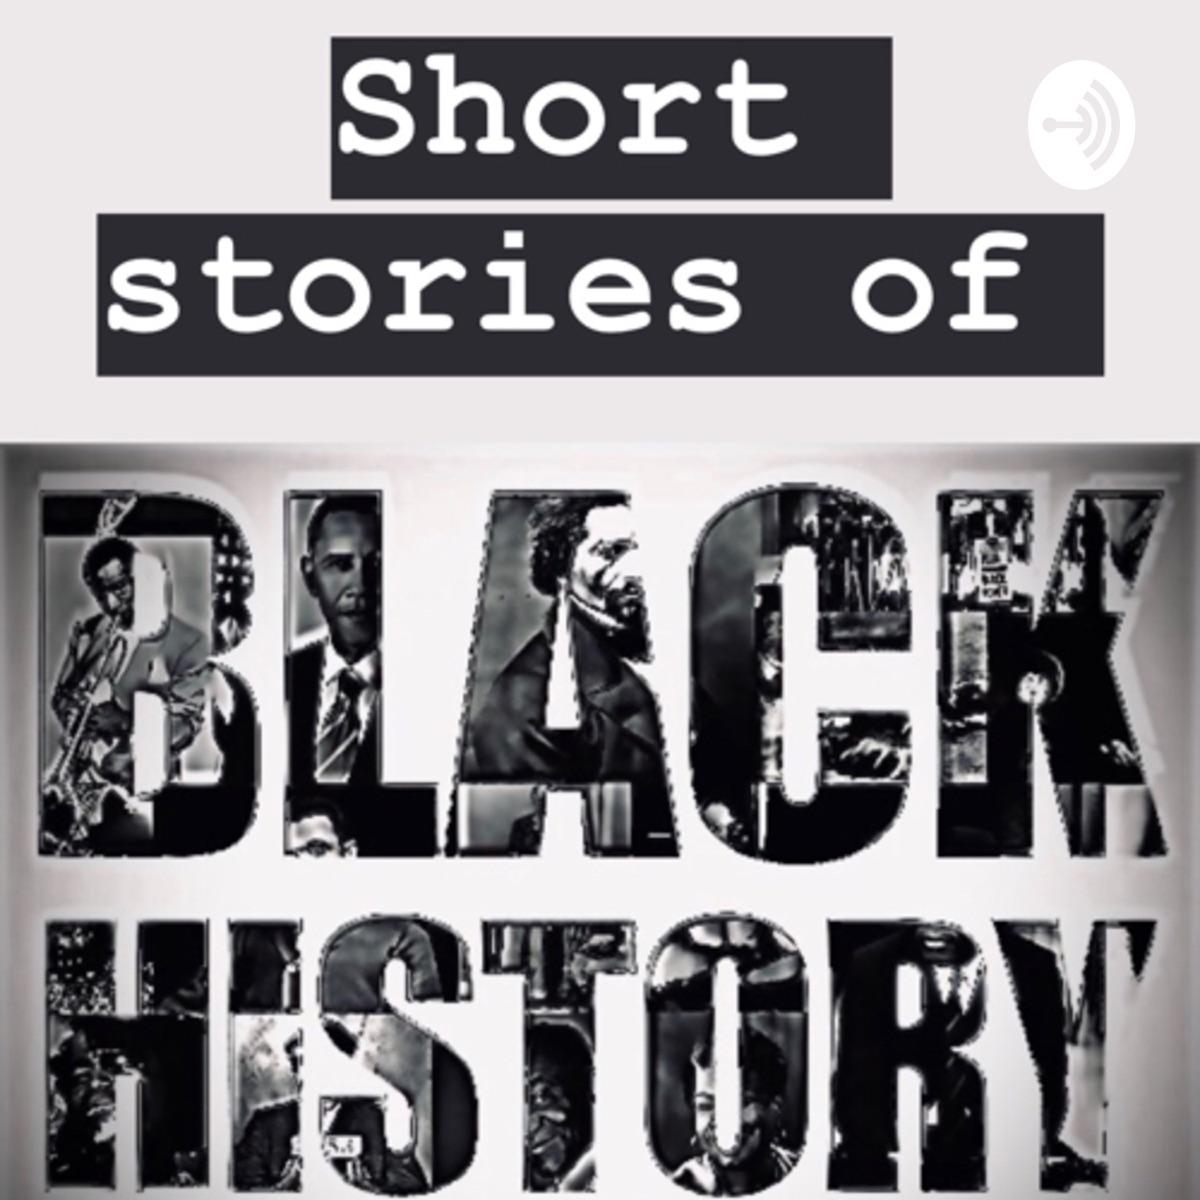 Short stories of Black History